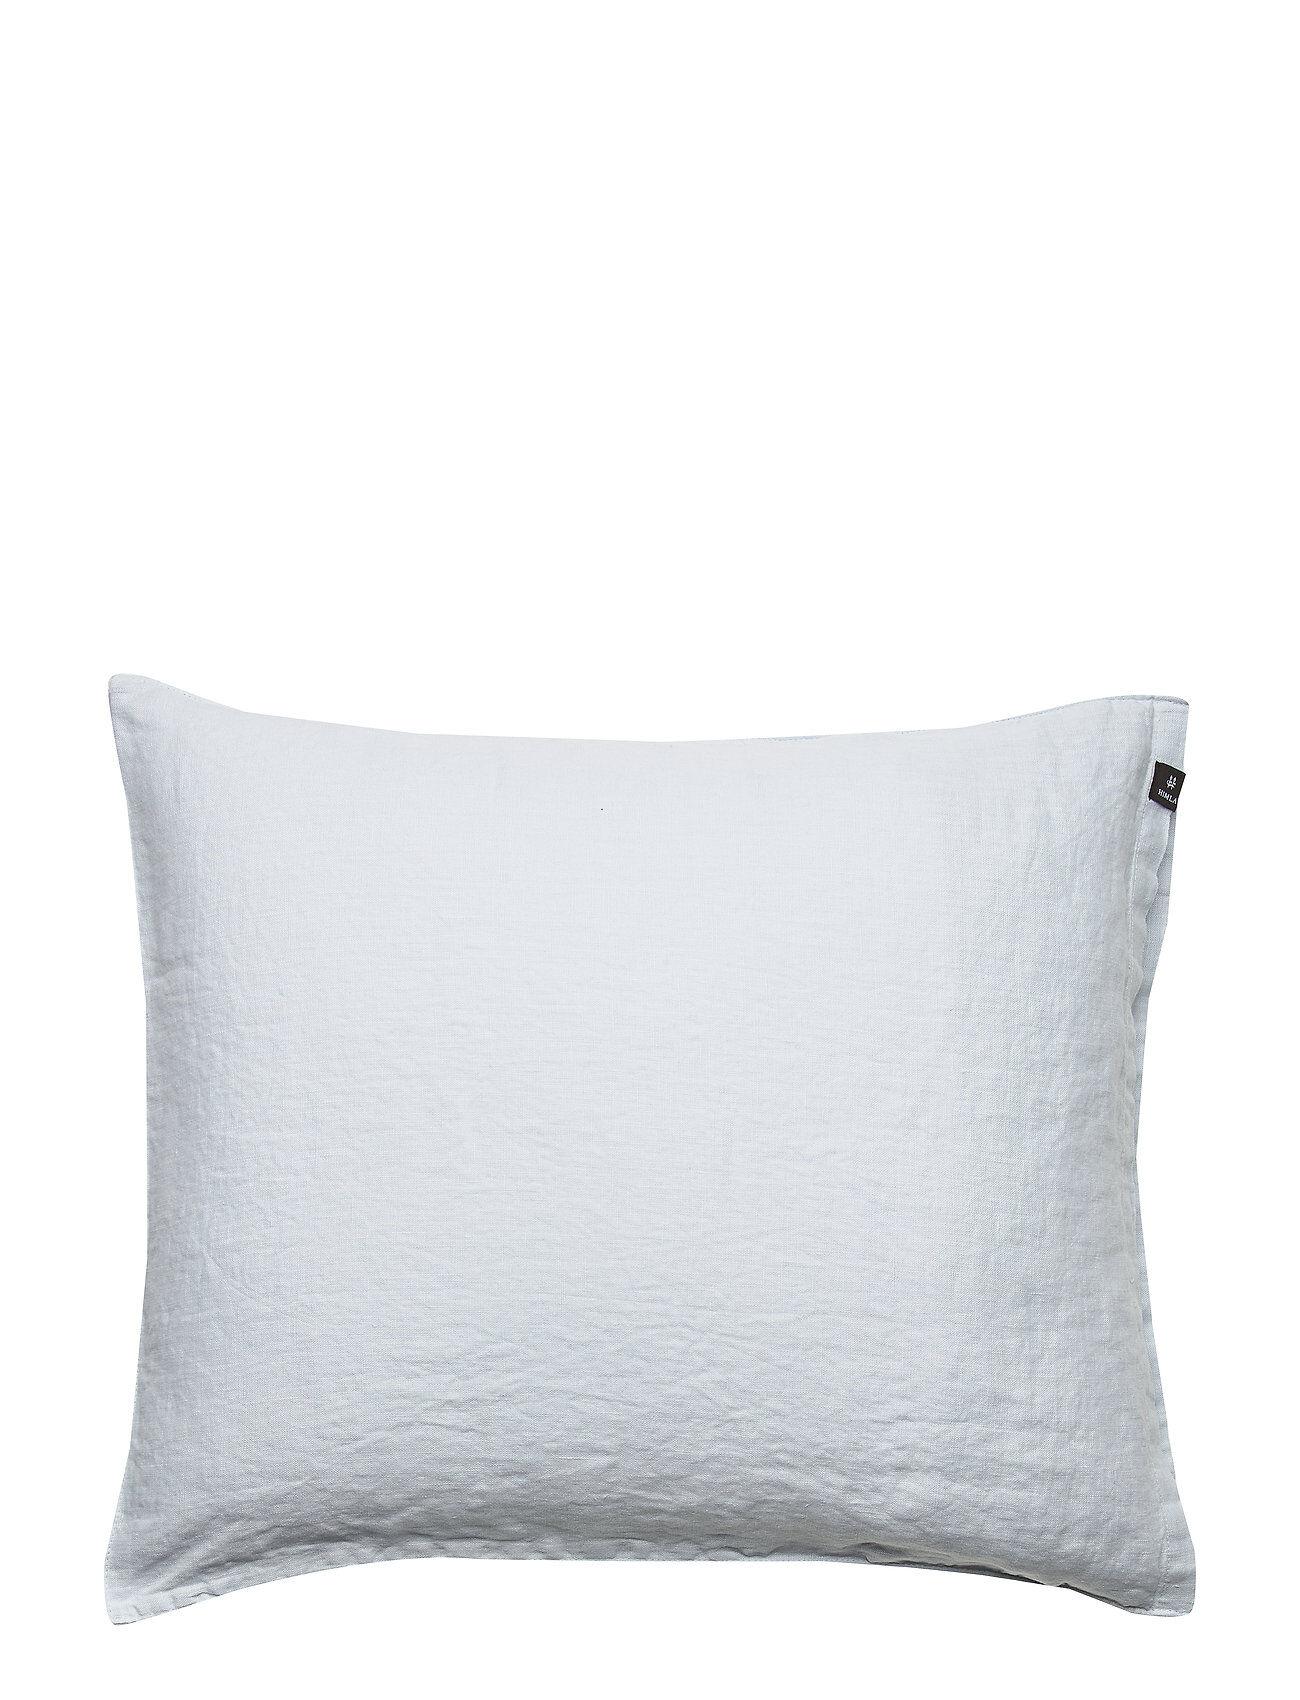 Himla Sunshine Pillowcase Home Bedroom Pillowcases Sininen Himla